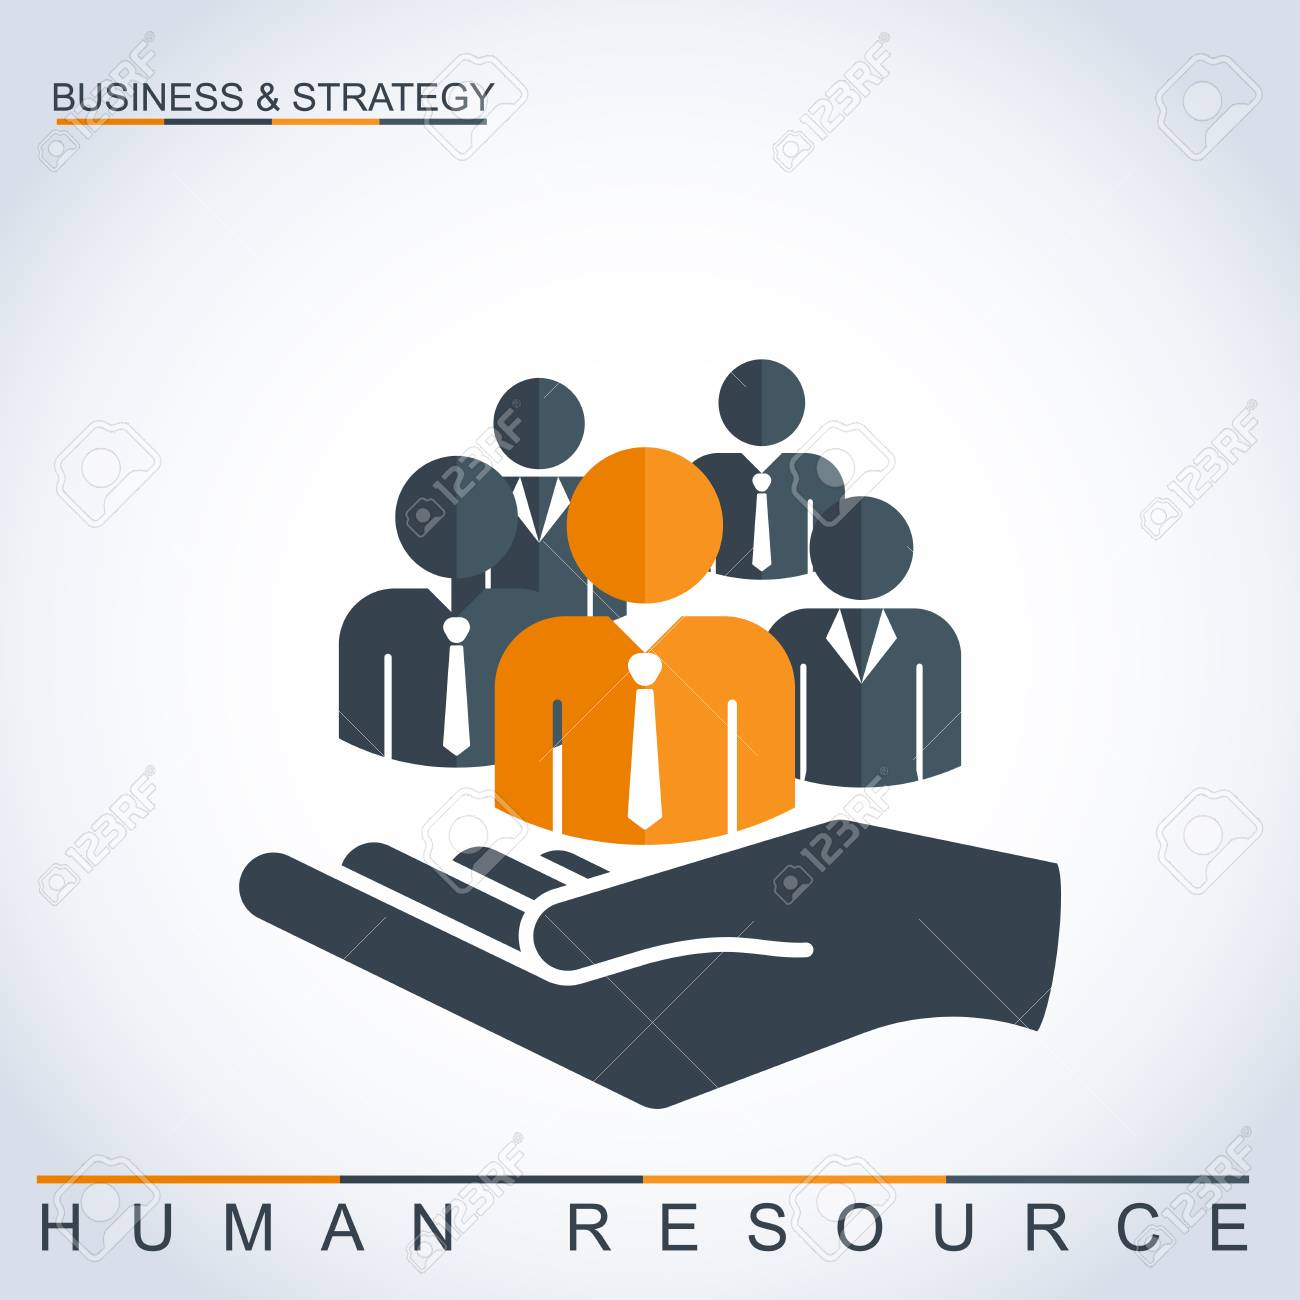 Human resources management concept  Businessmen and businesswomen